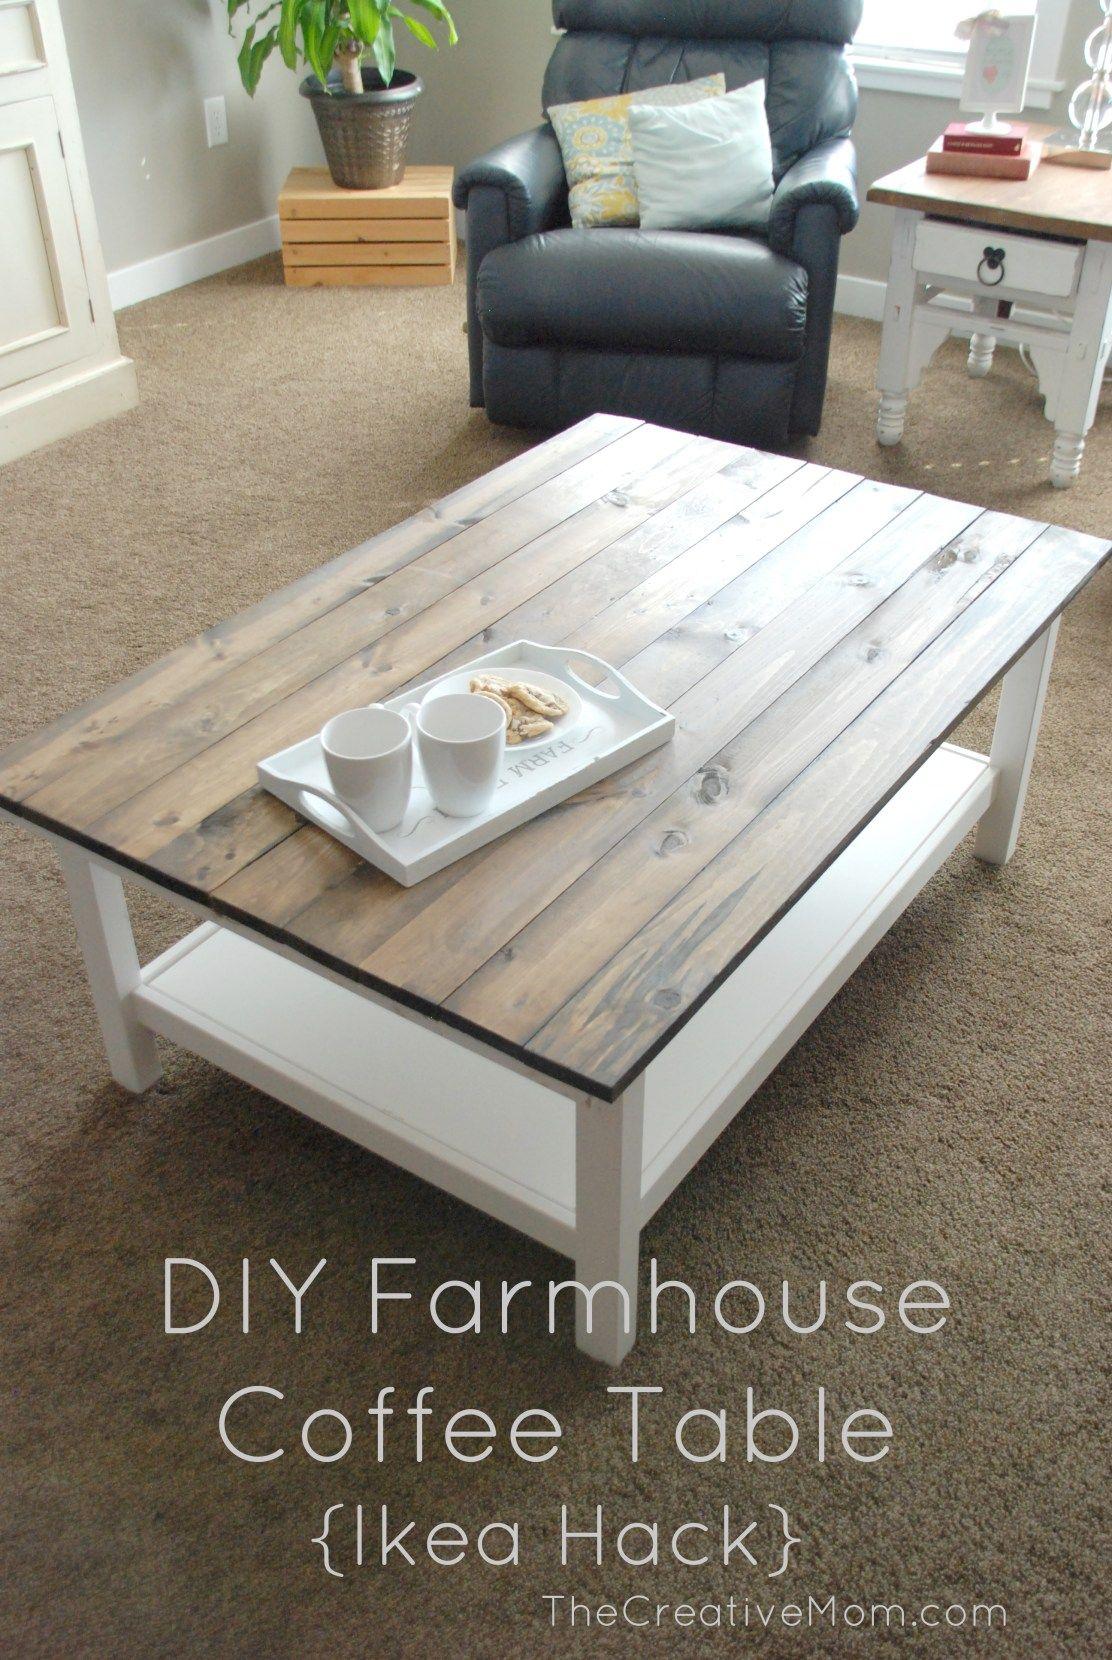 Diy Farmhouse Coffee Table Ikea Hack Coffee Table Ikea Hack